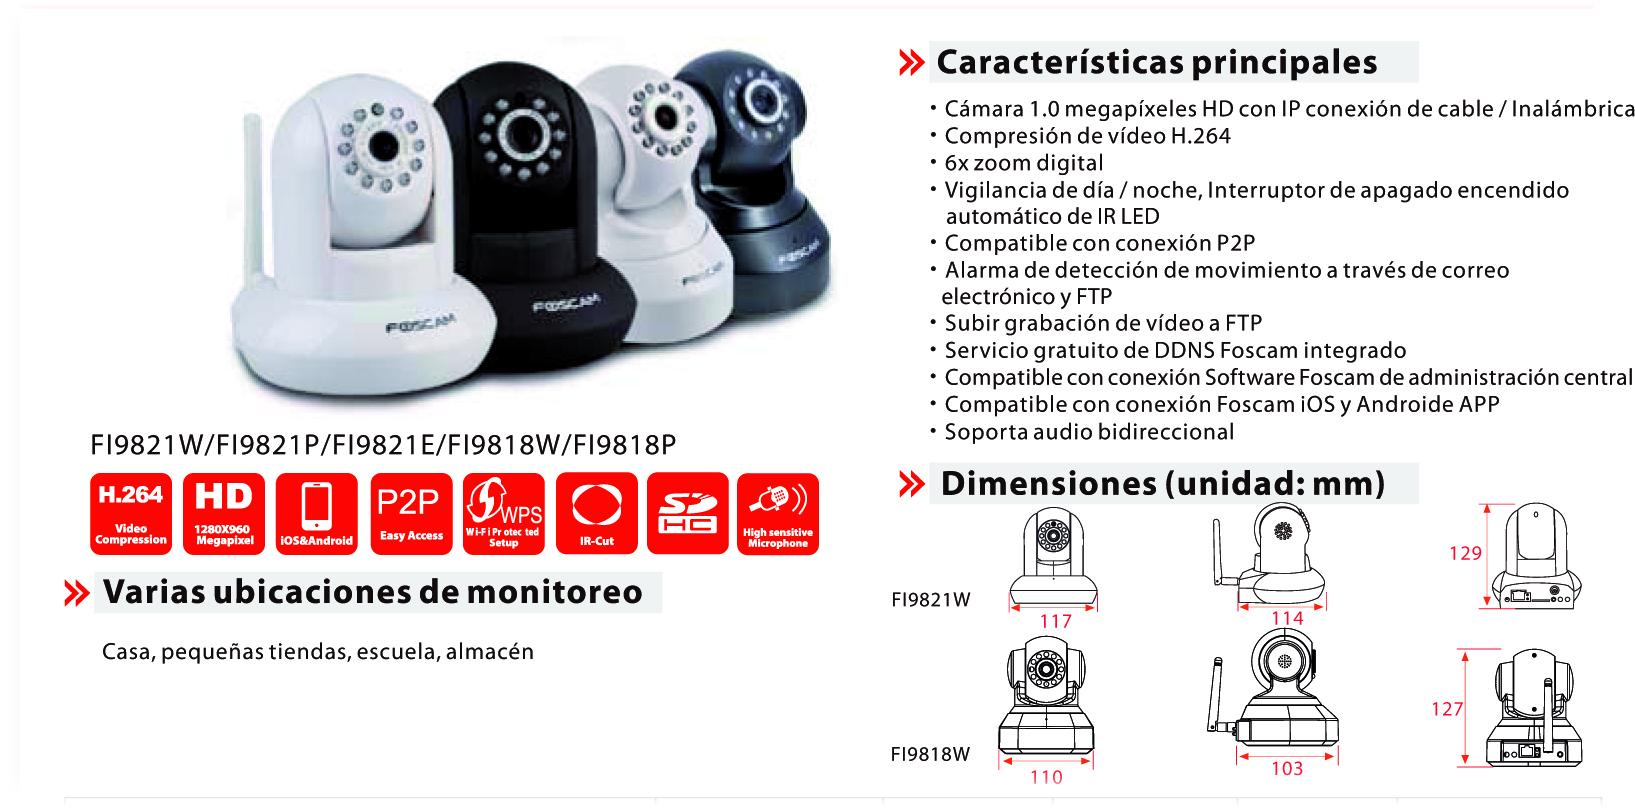 Camara IP FI9821W interior HD